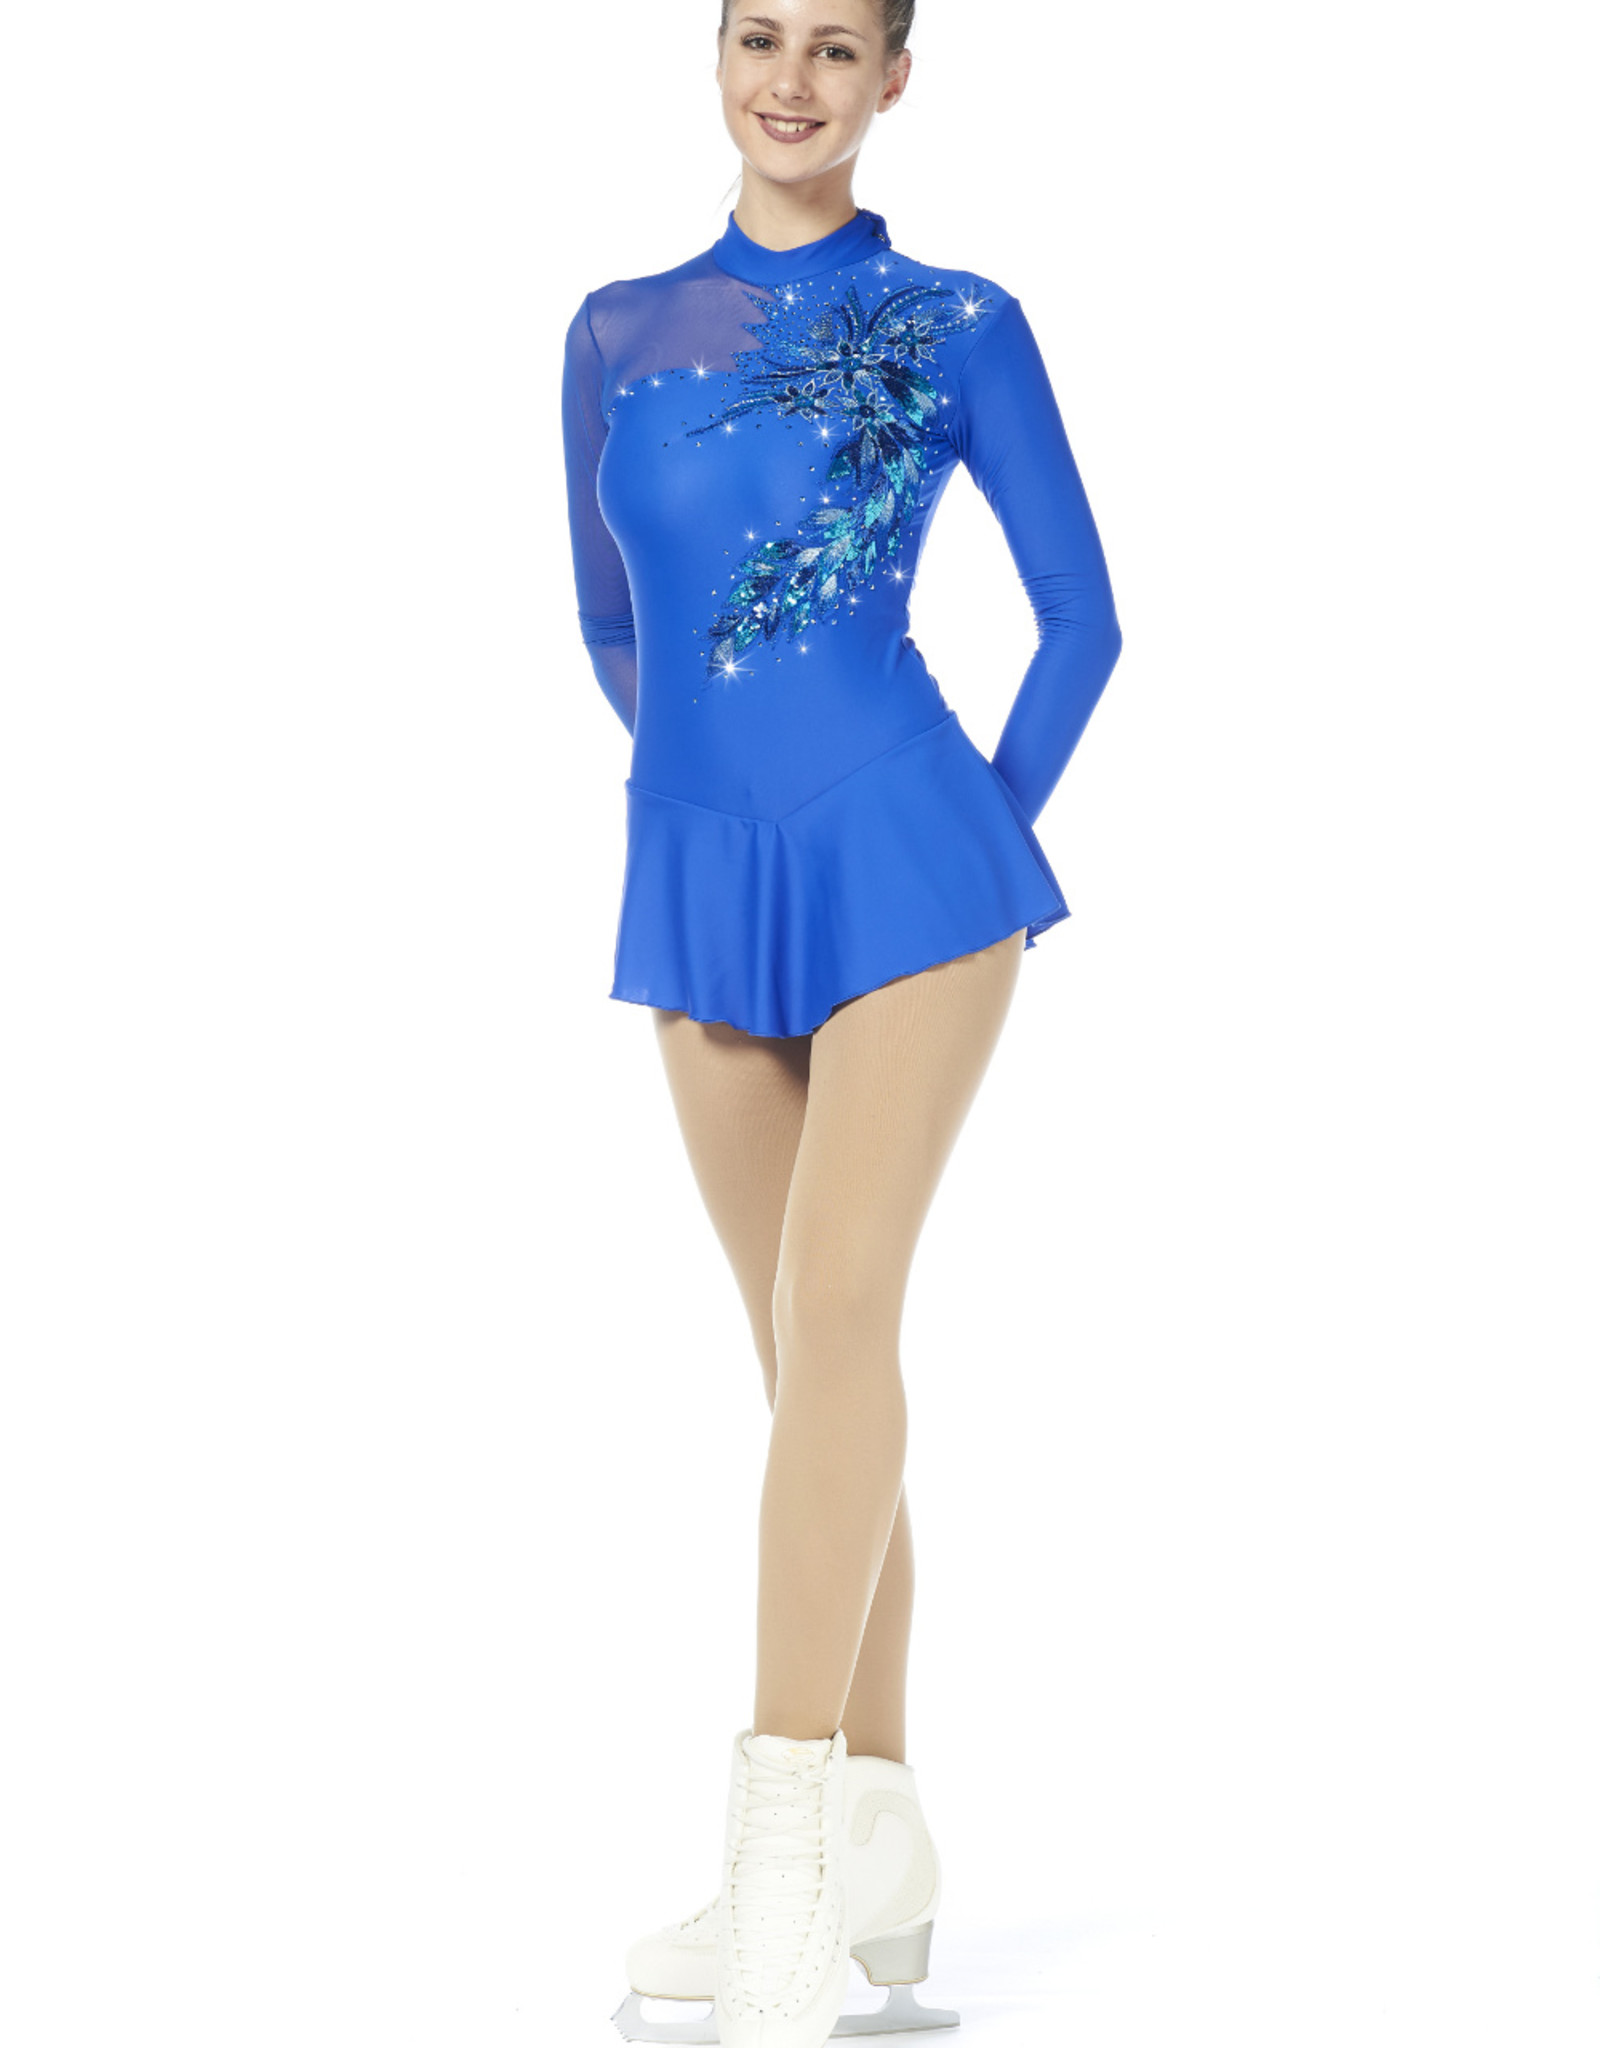 Sagester 2059 Competition Dress Bluette